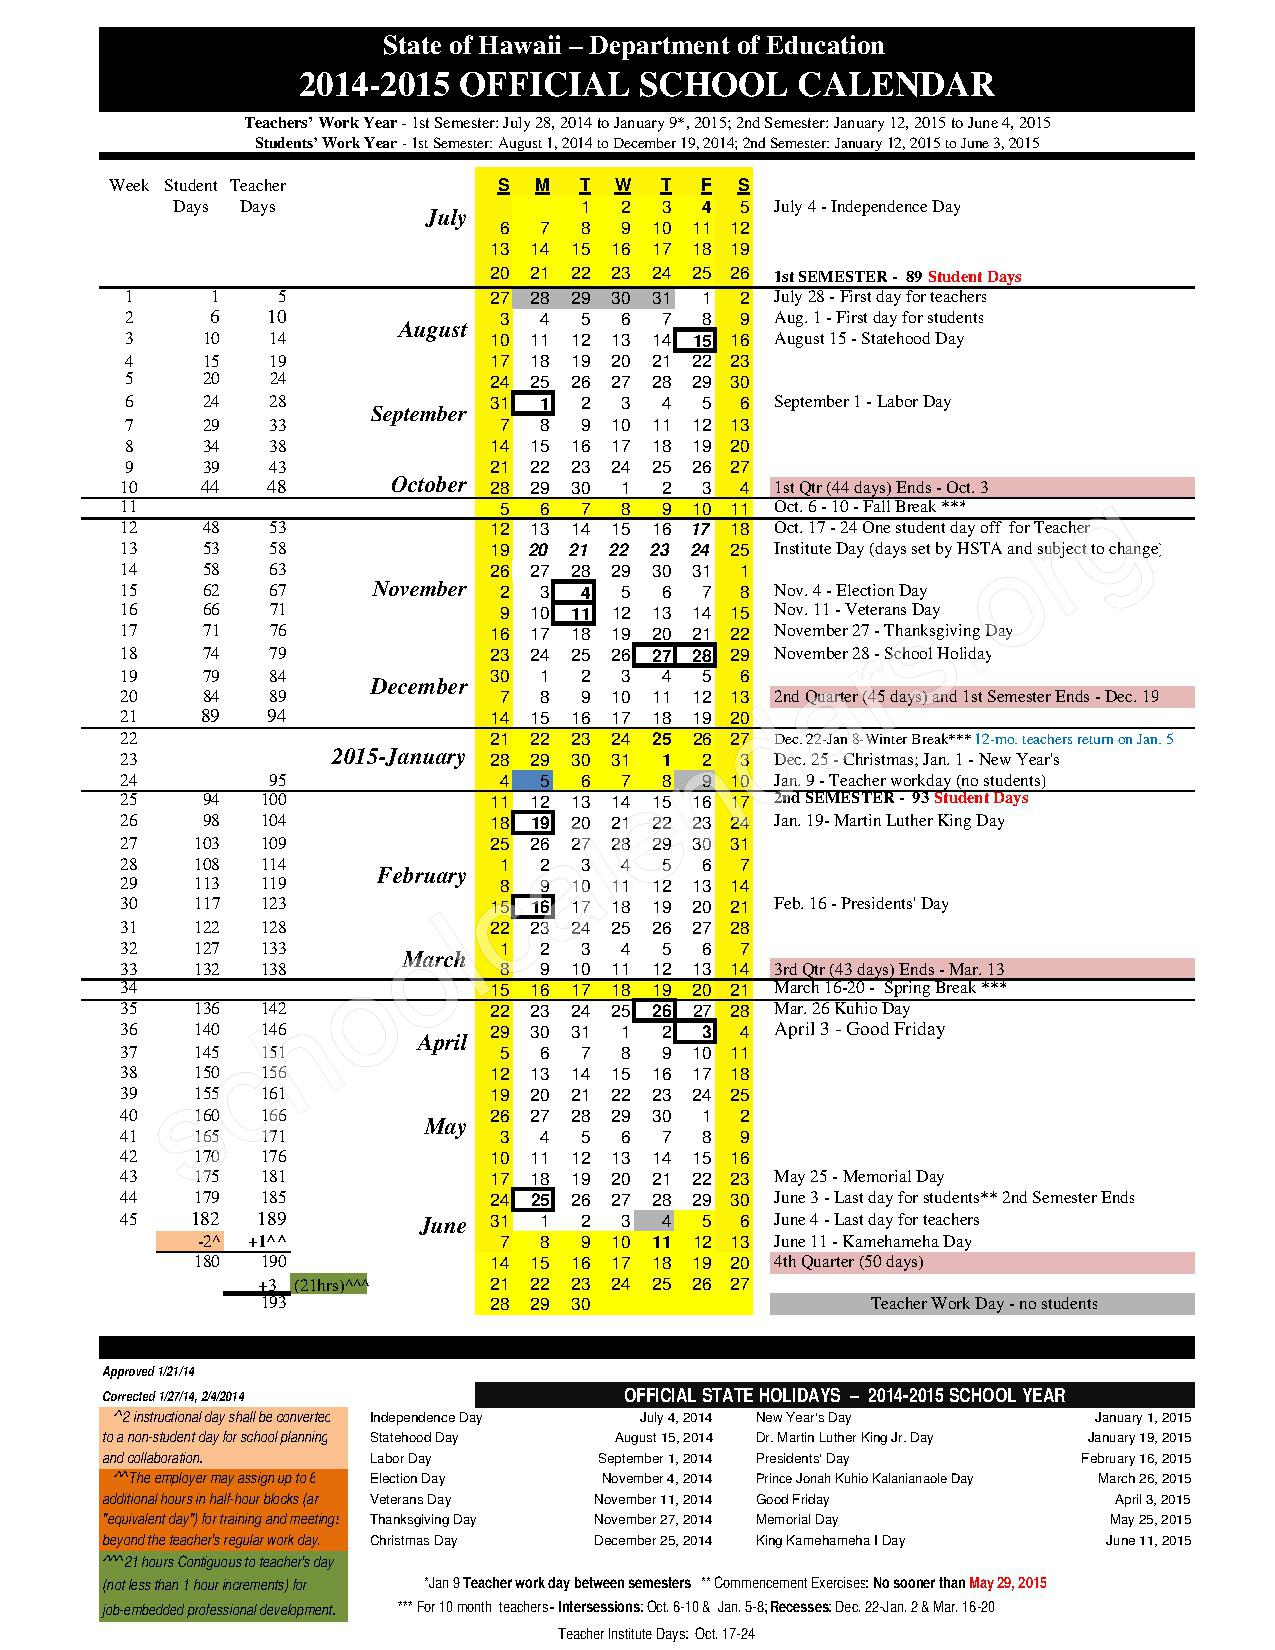 School Calendars Google